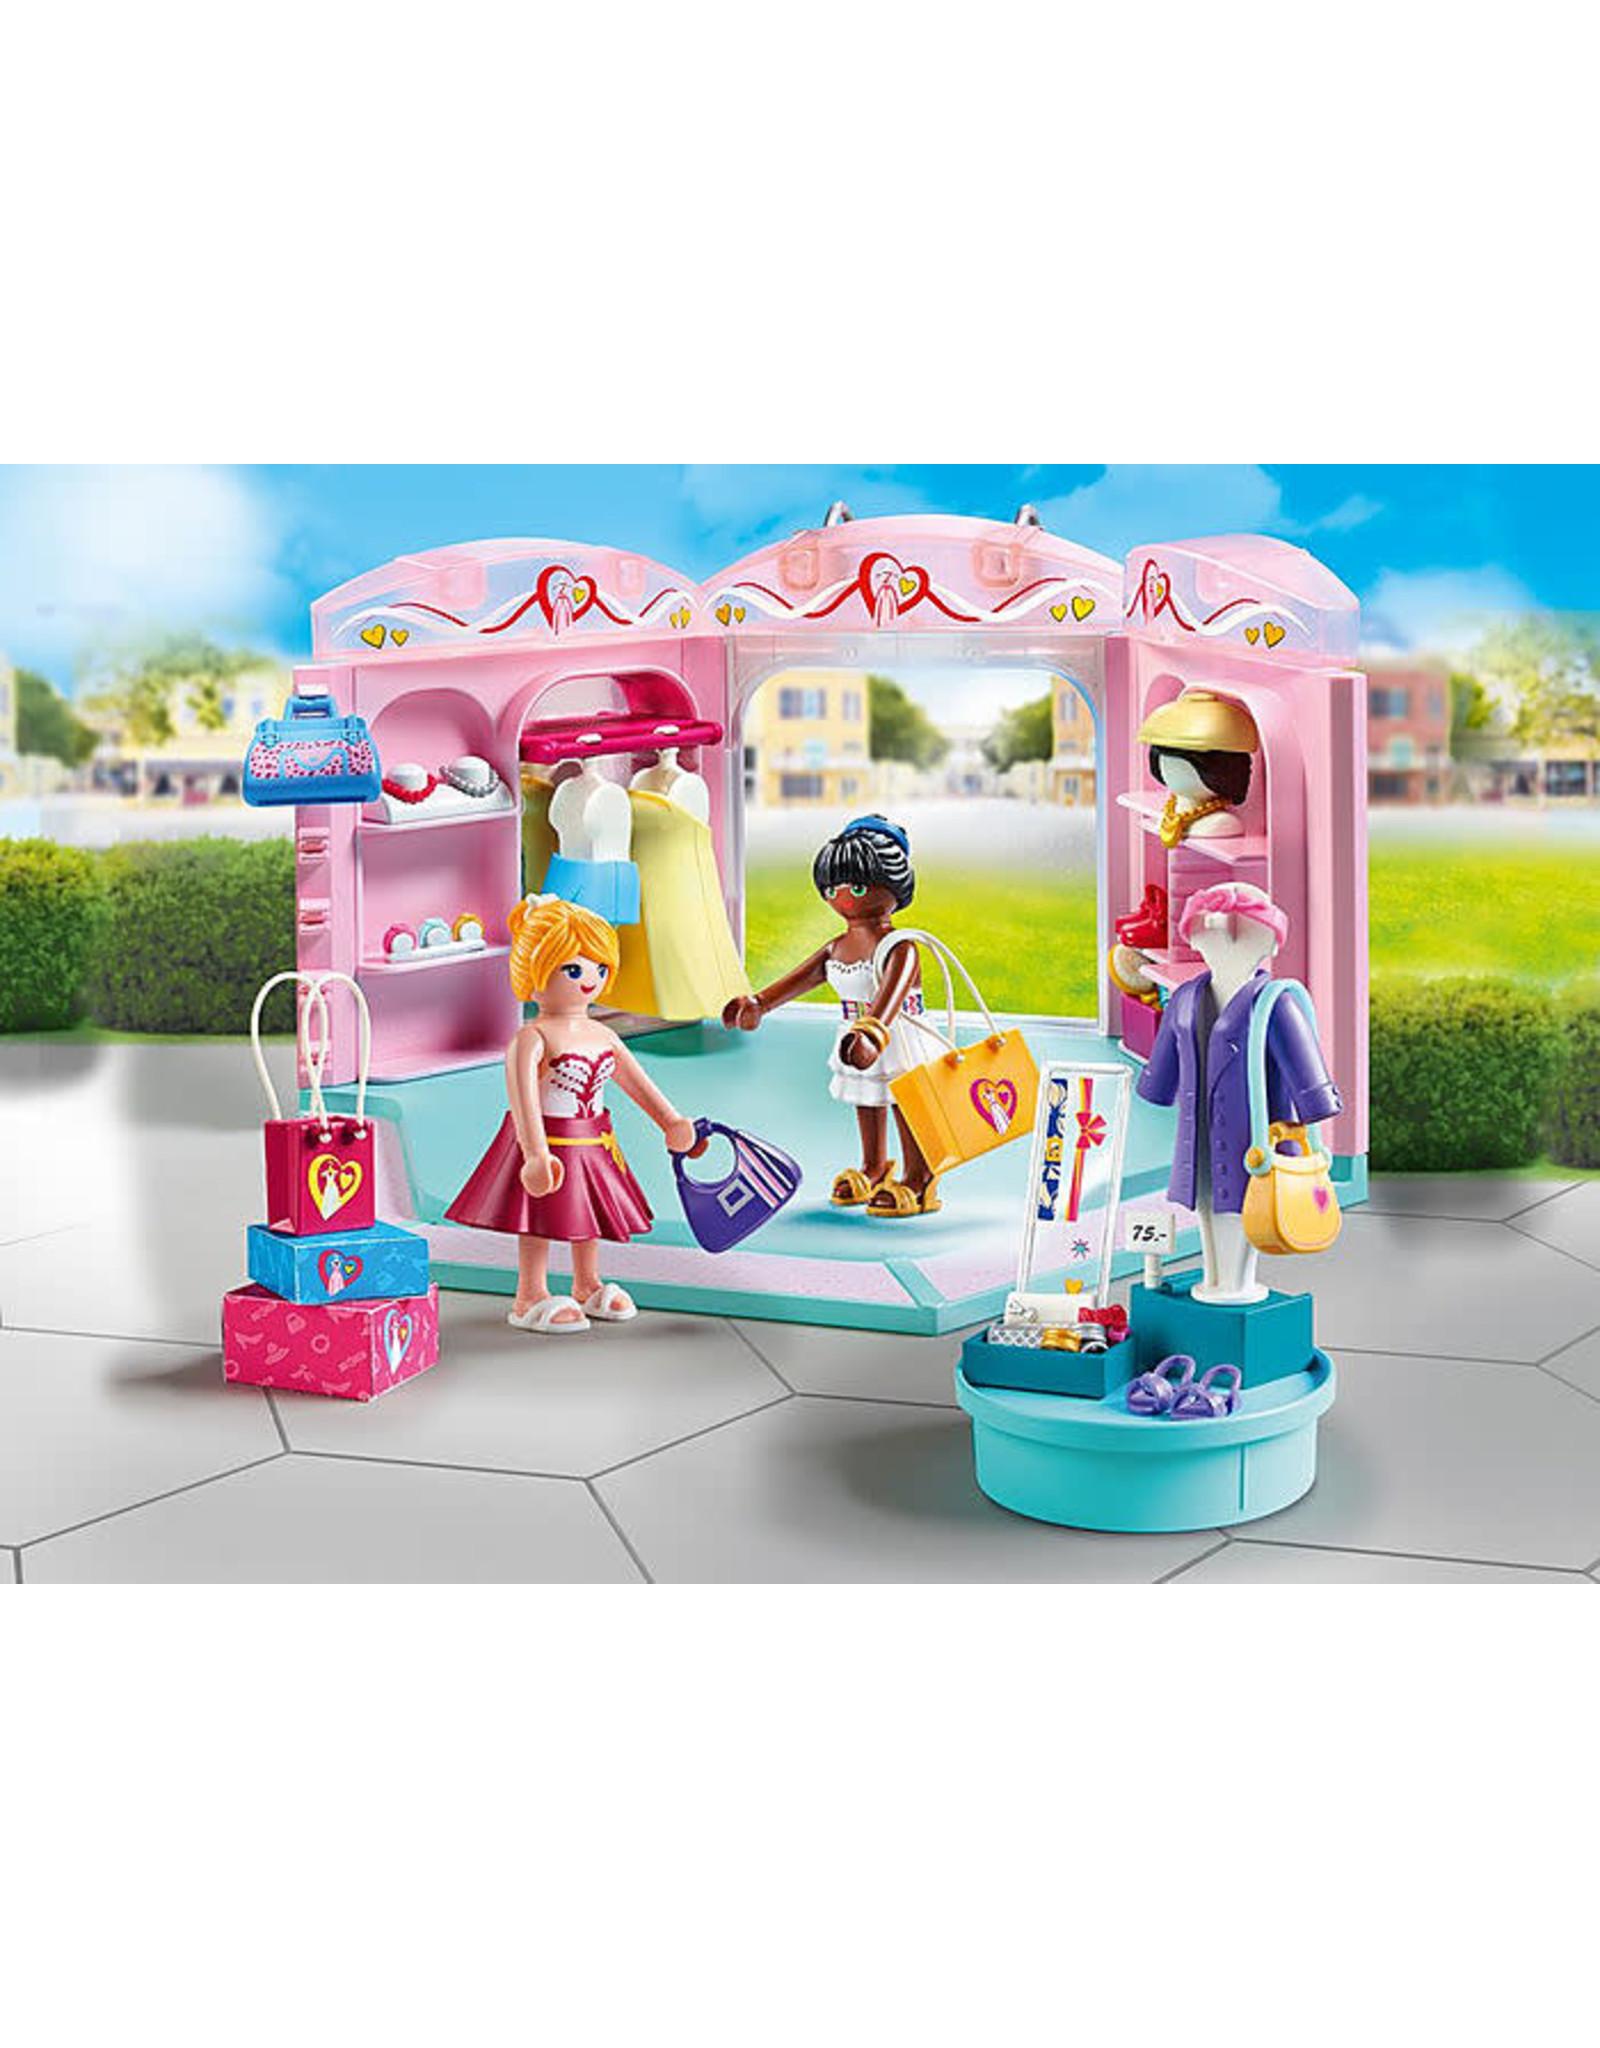 Playmobil Fashion Store